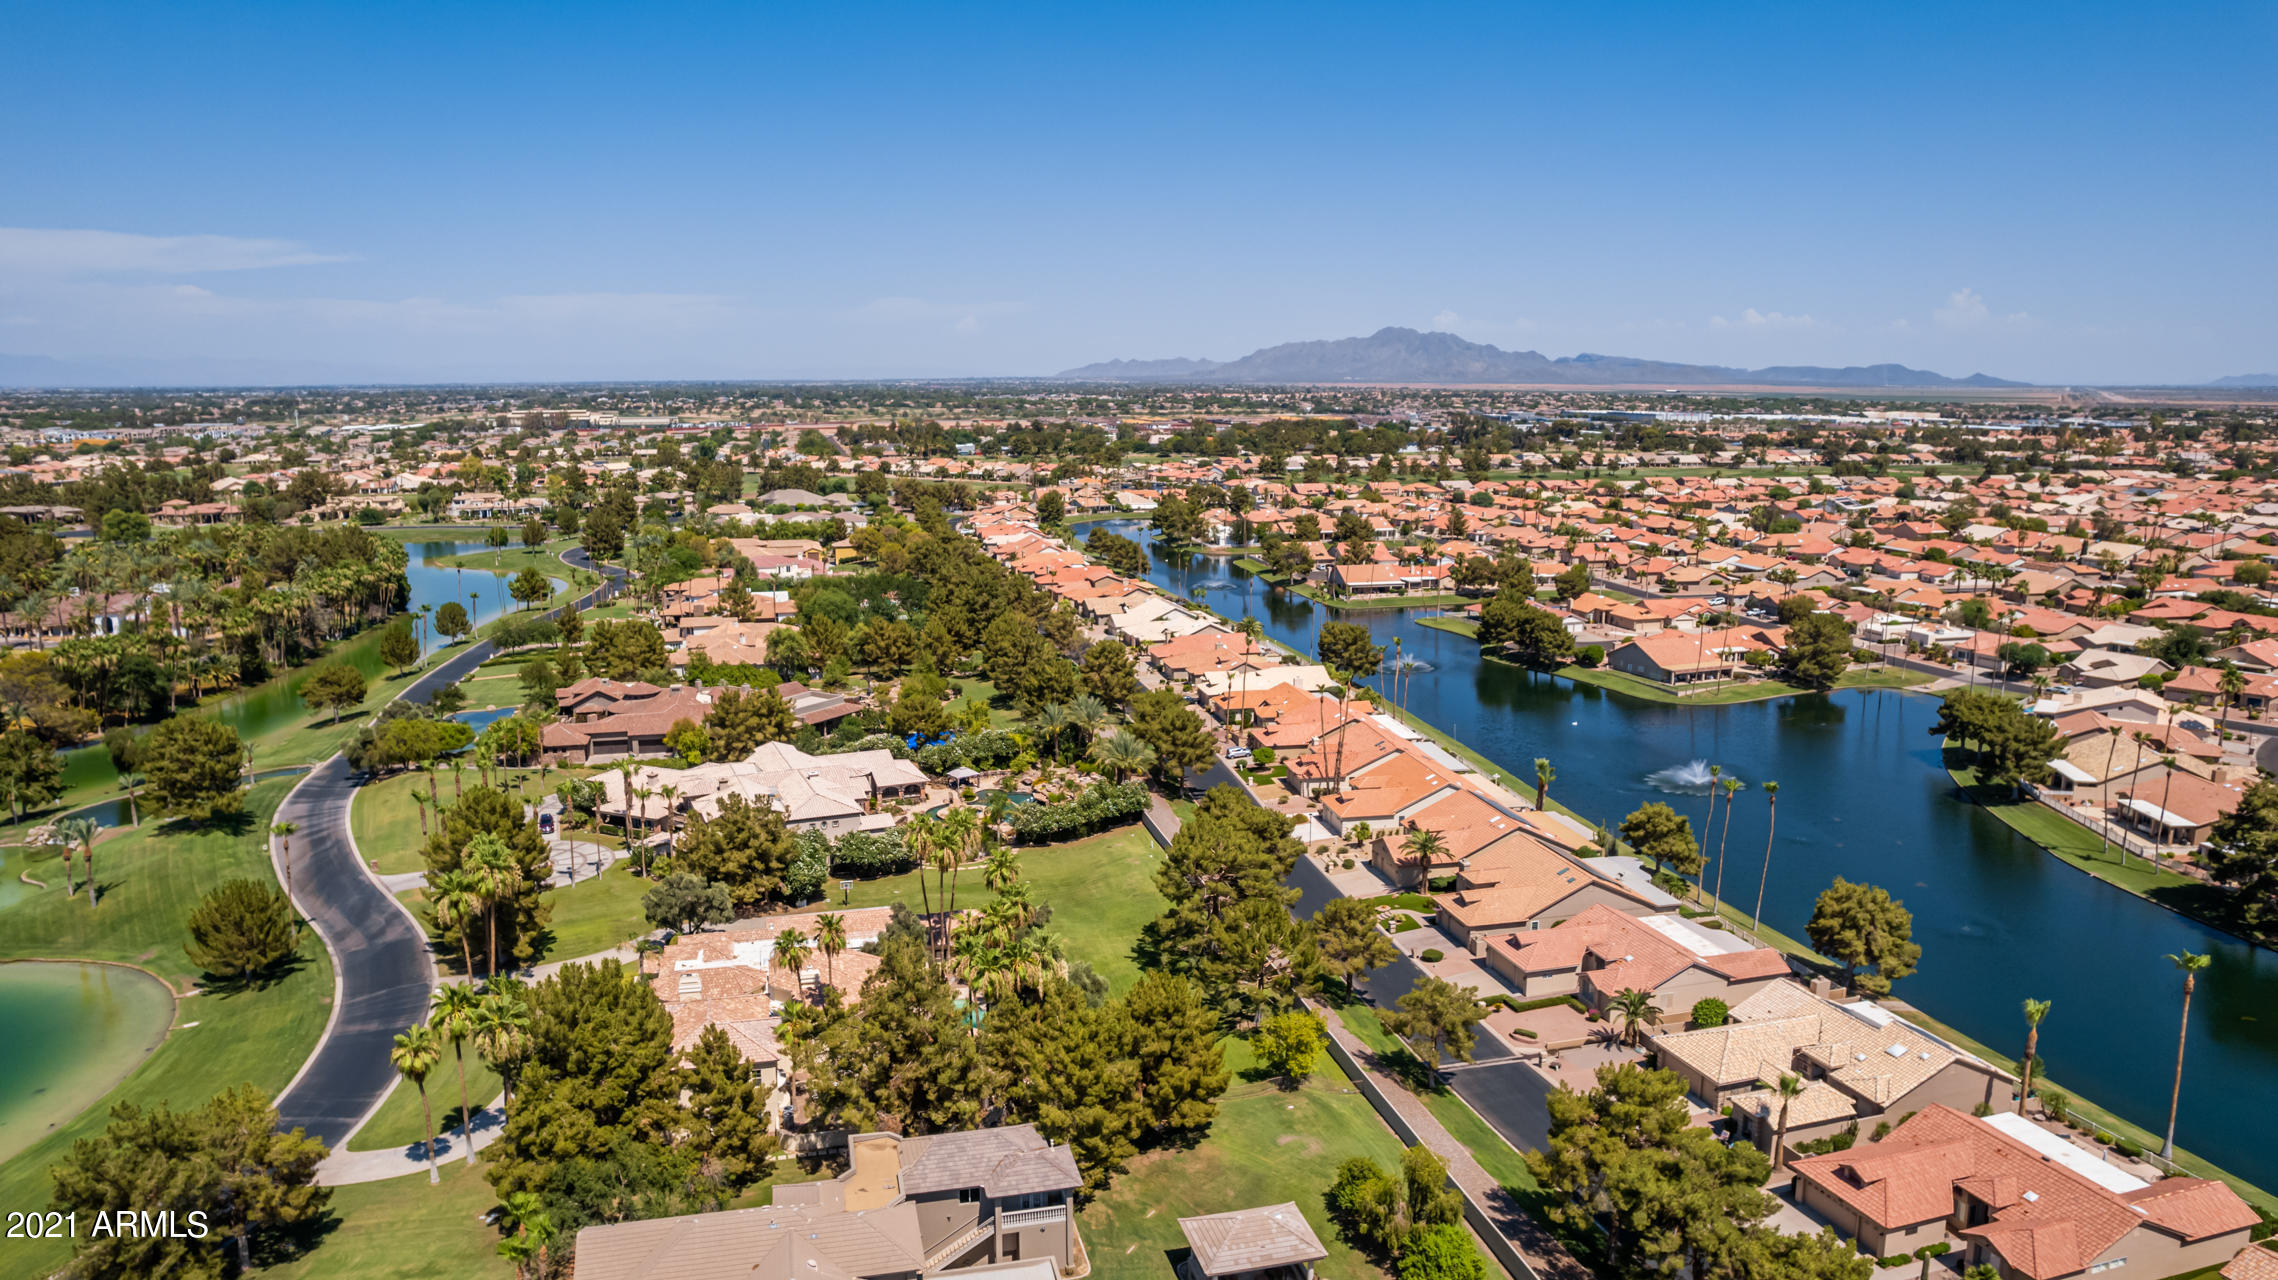 MLS 6263026 7 E OAKWOOD HILLS Drive, Chandler, AZ 85248